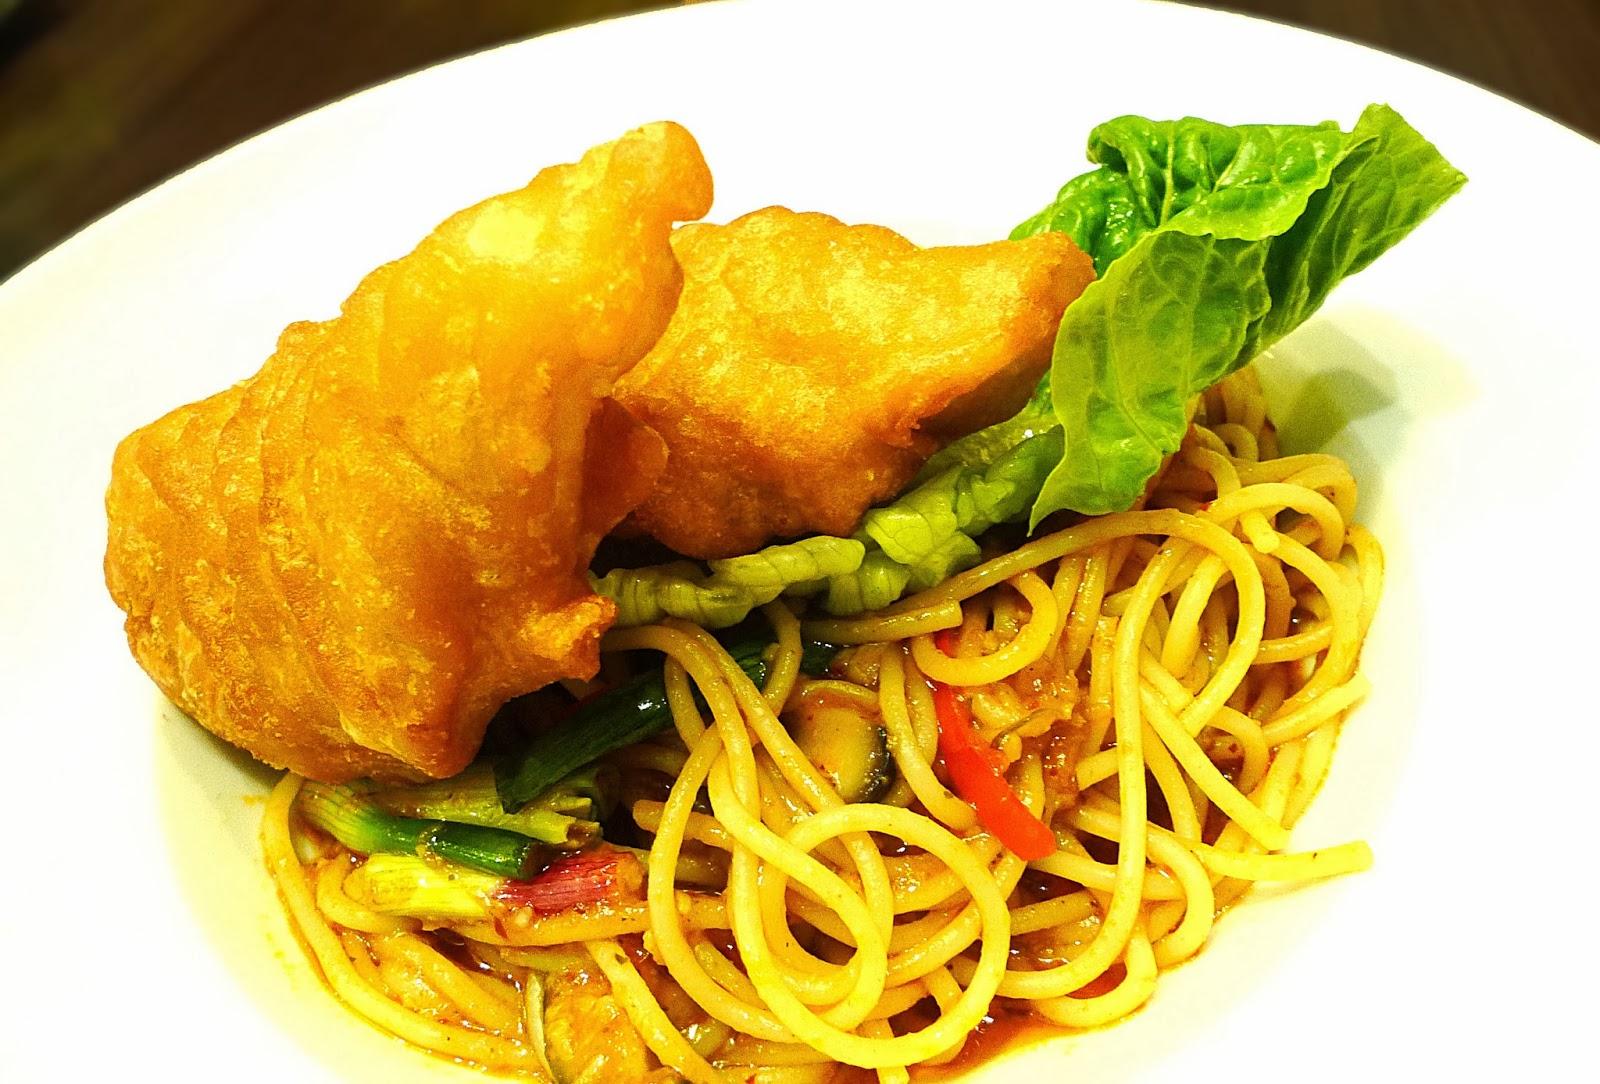 Chili fish pasta